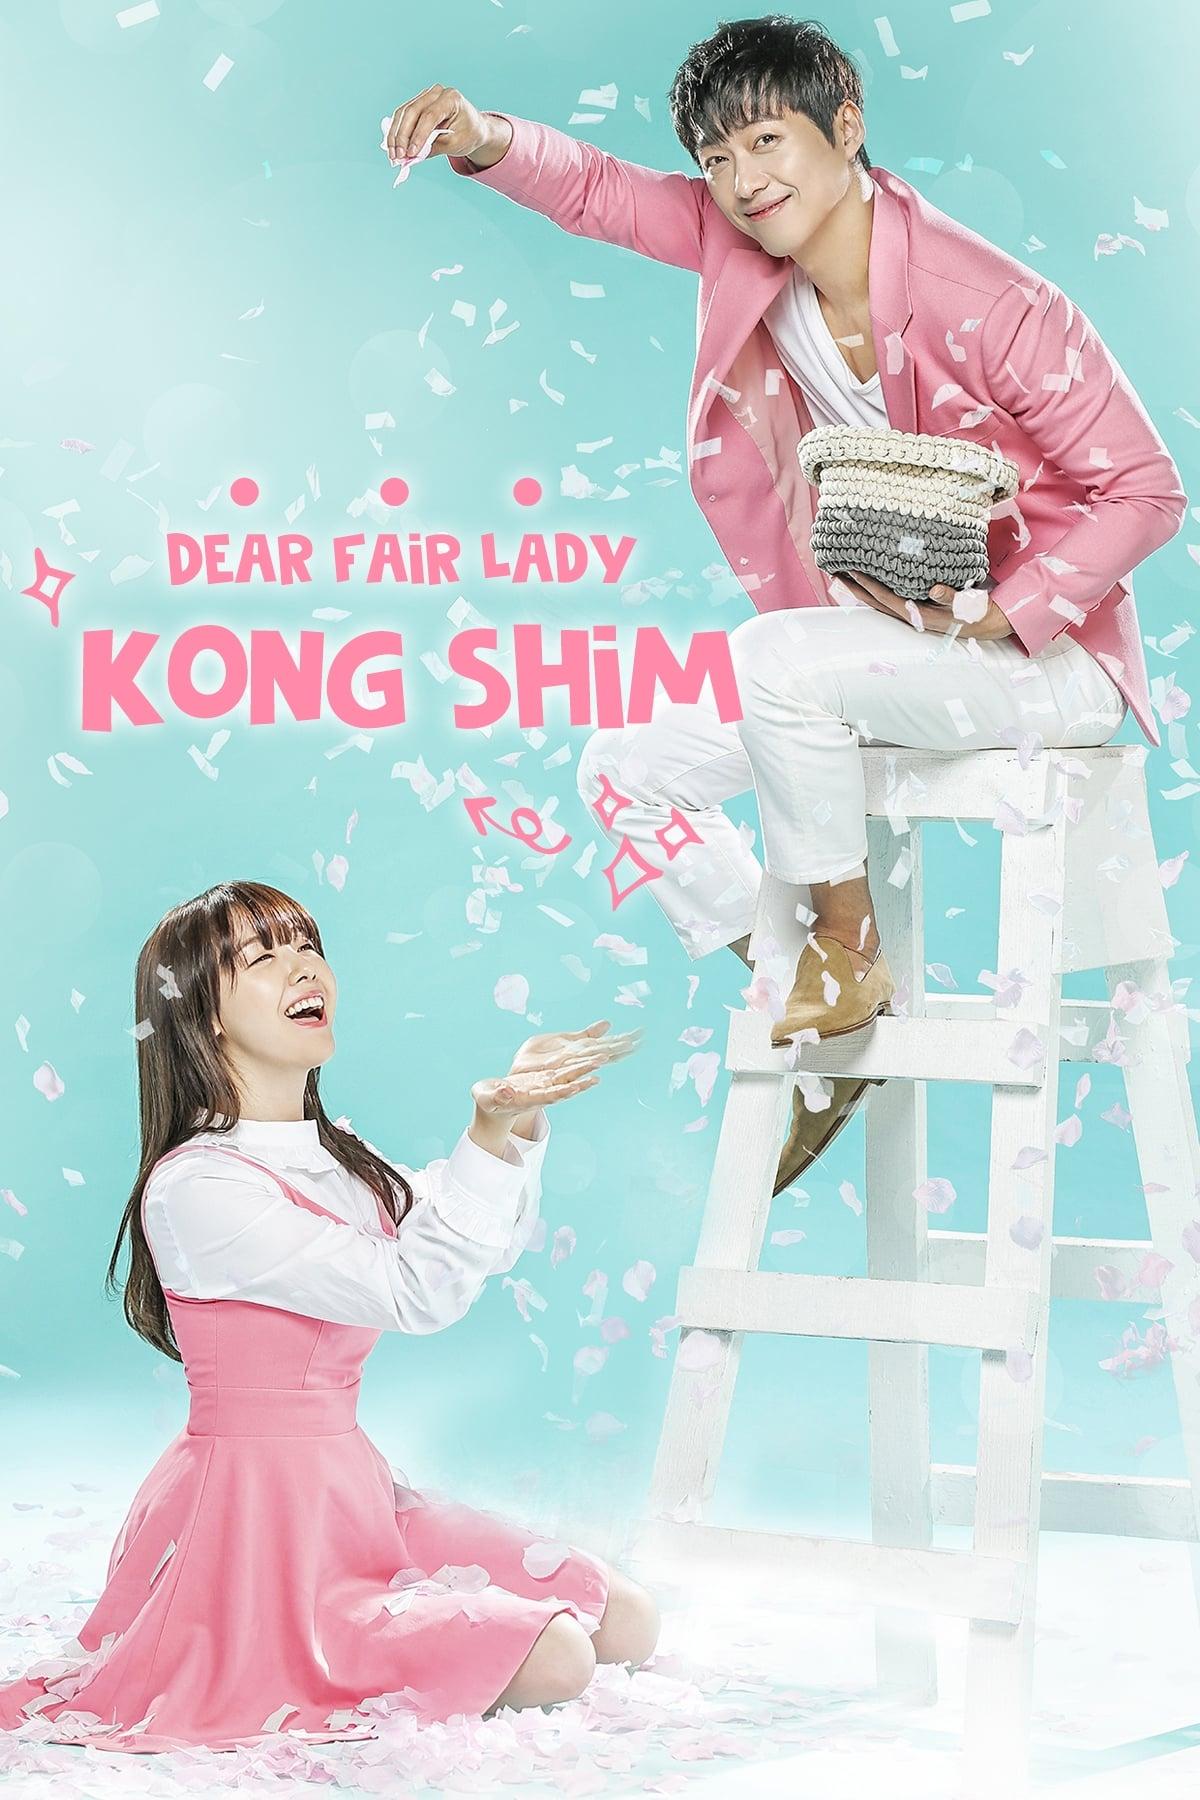 Dear Fair Lady Kong Shim (2016)